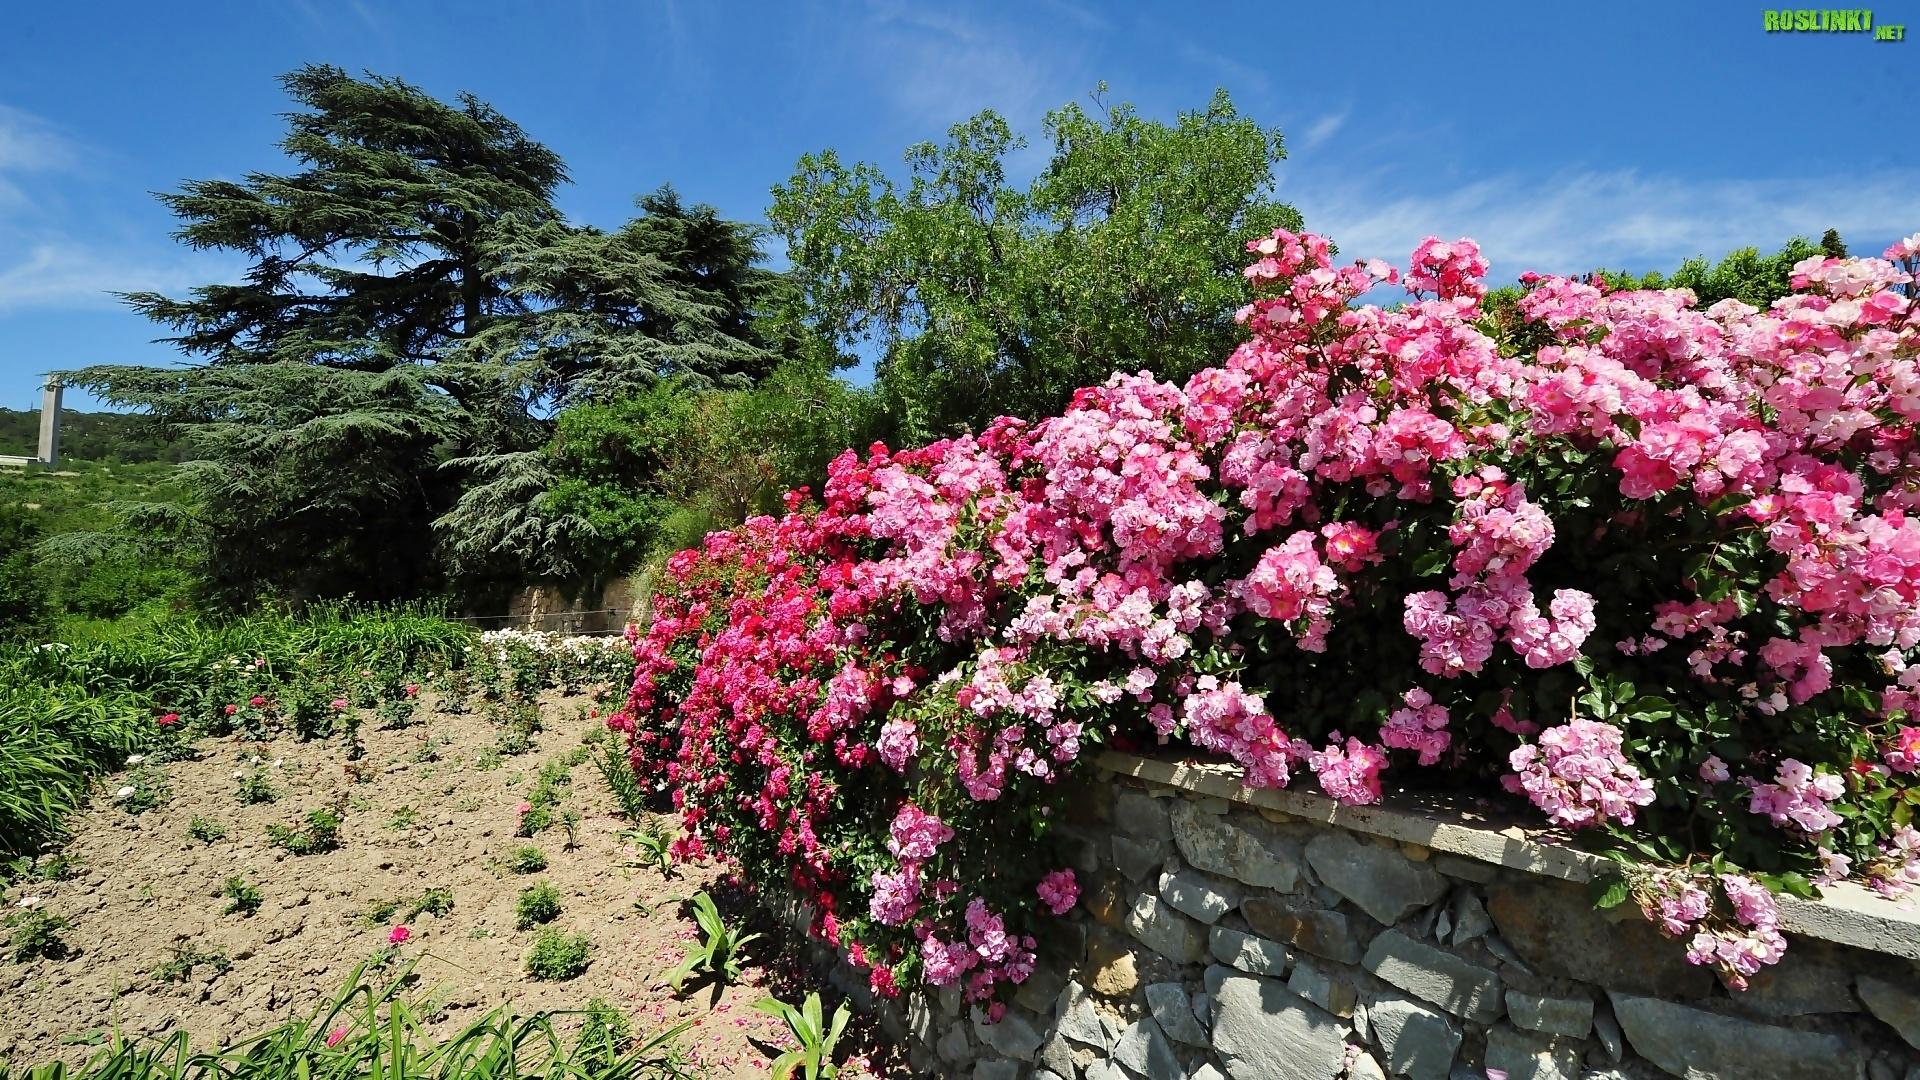 Ogród, Drzewa, Murek, Kwitnące, Krzewy, Różane